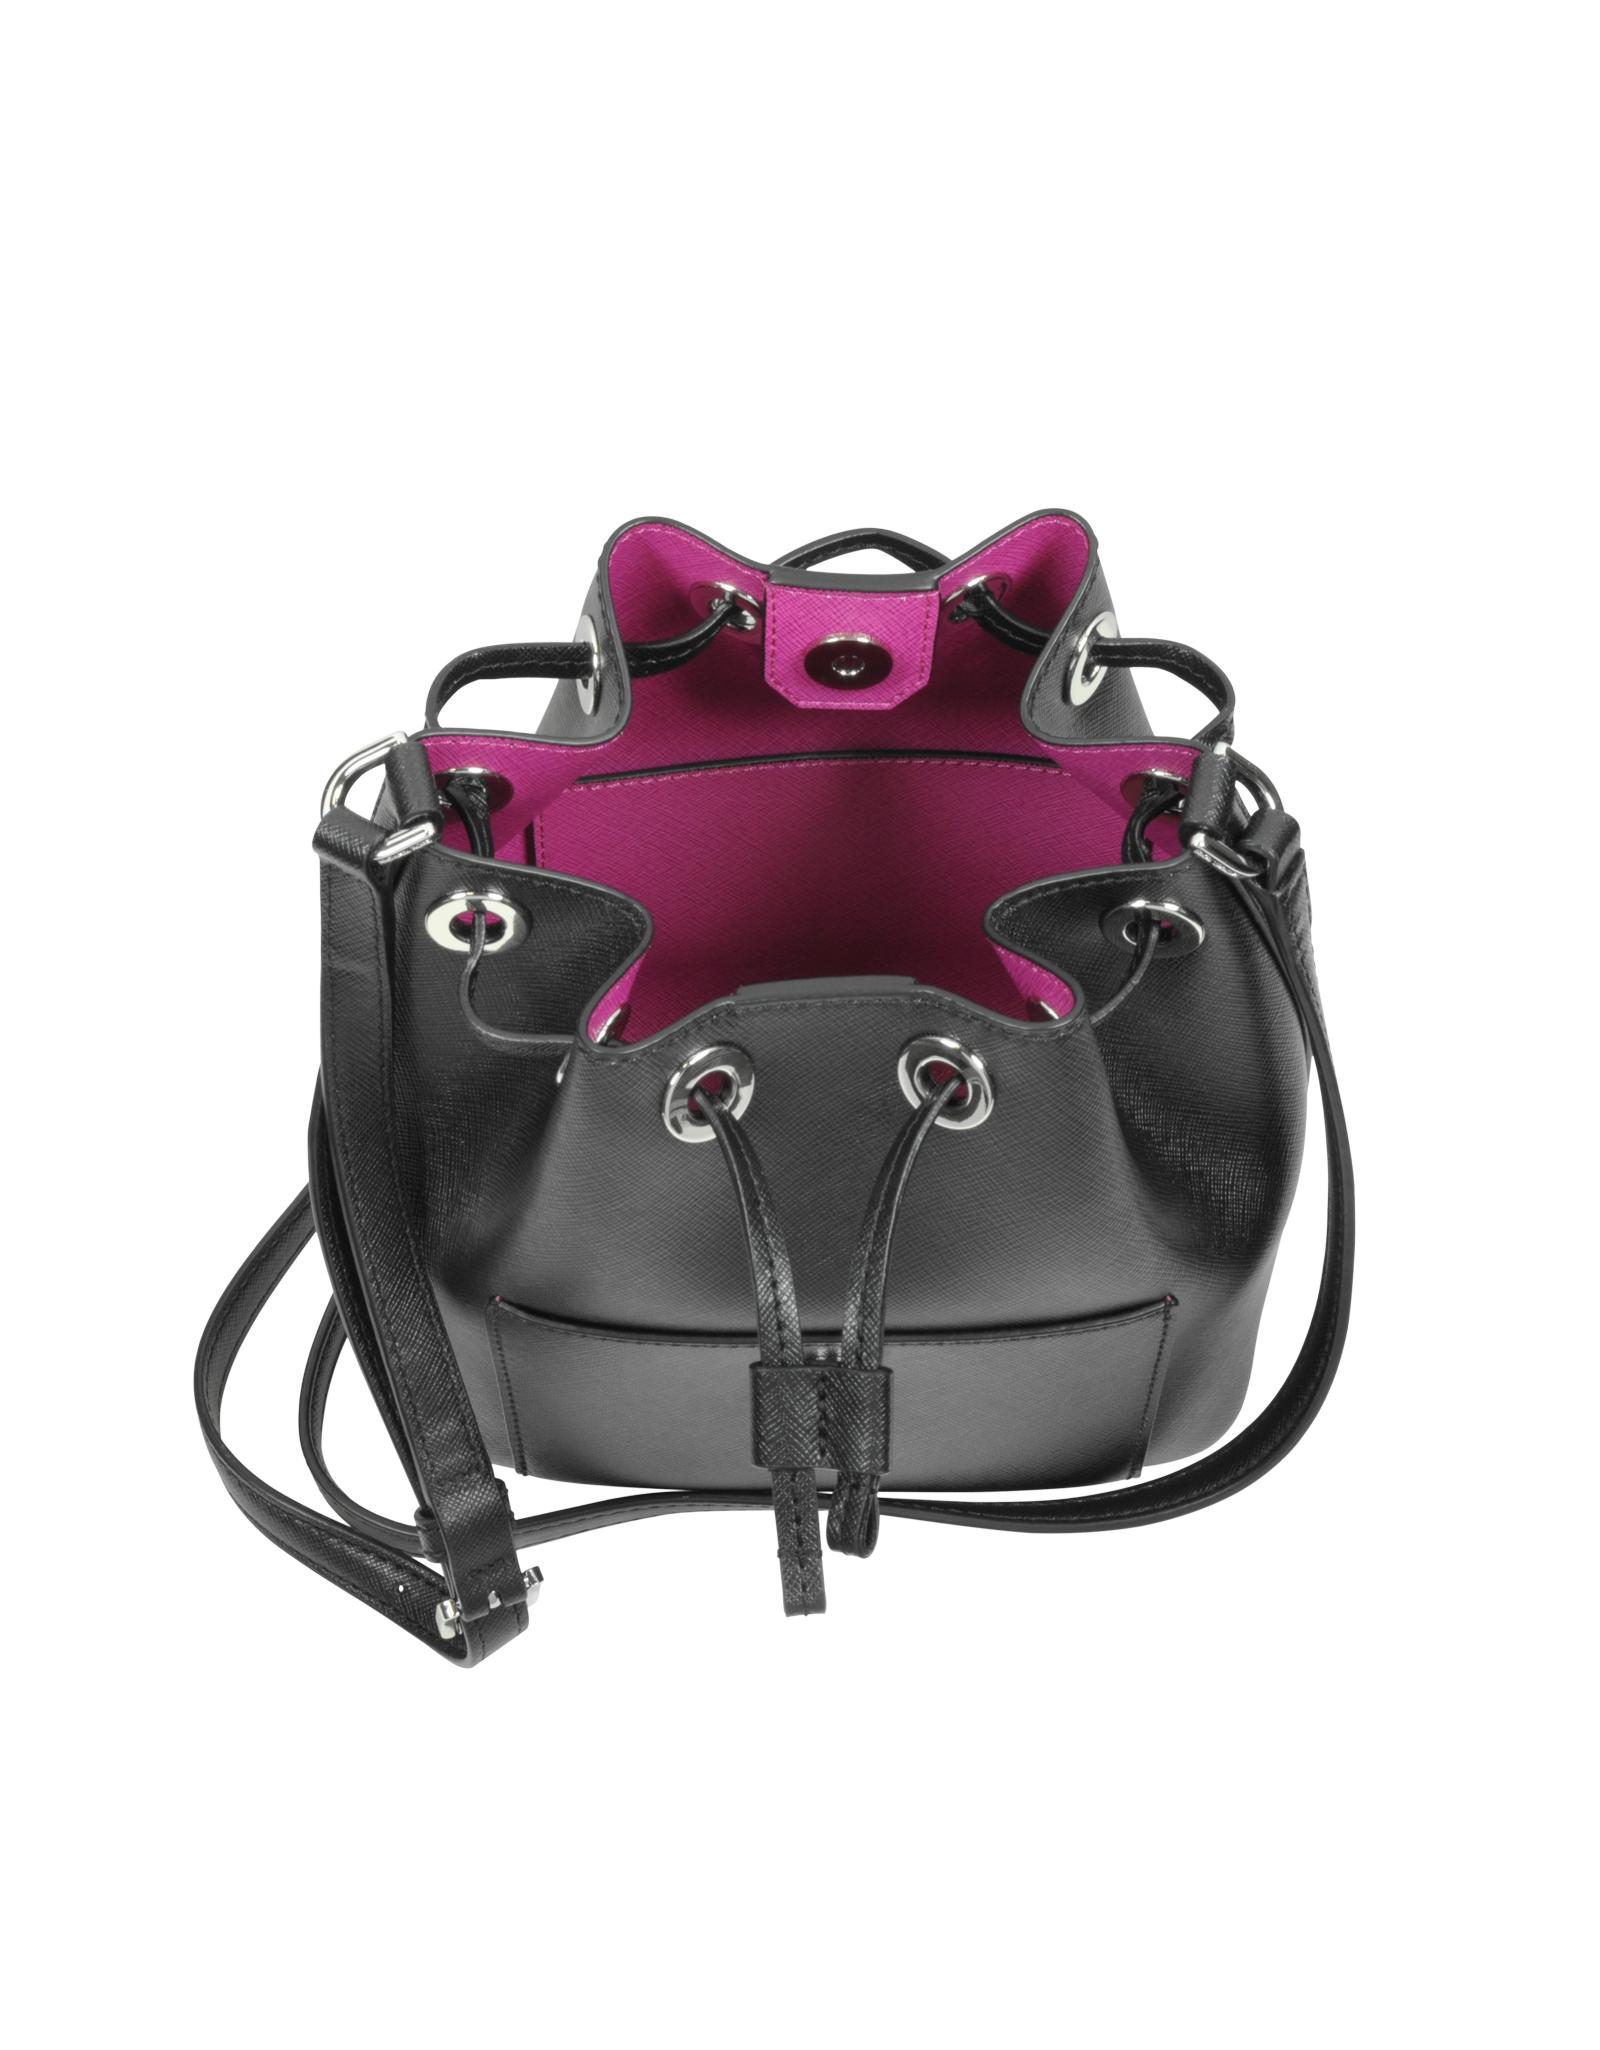 1b3929a41bad2 ... Michael kors Greenwich Saffiano-Leather Bucket Bag in Black ...